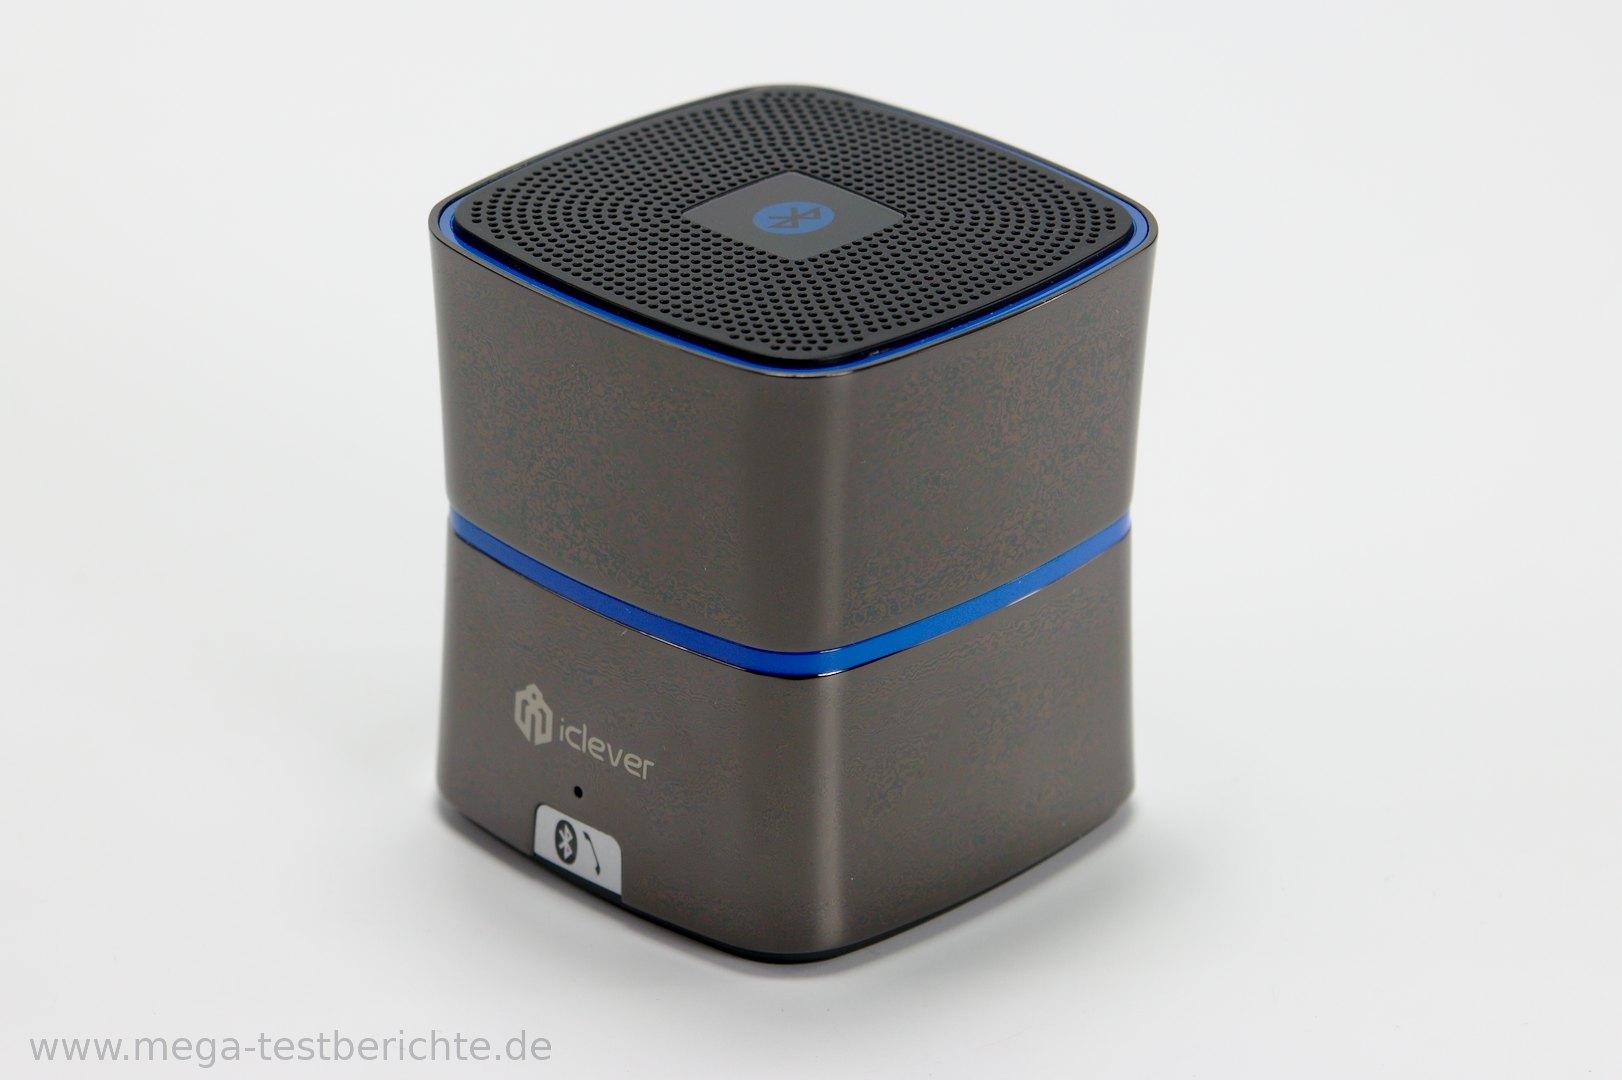 mini bluetooth lautsprecher im test iclever ic bts02. Black Bedroom Furniture Sets. Home Design Ideas